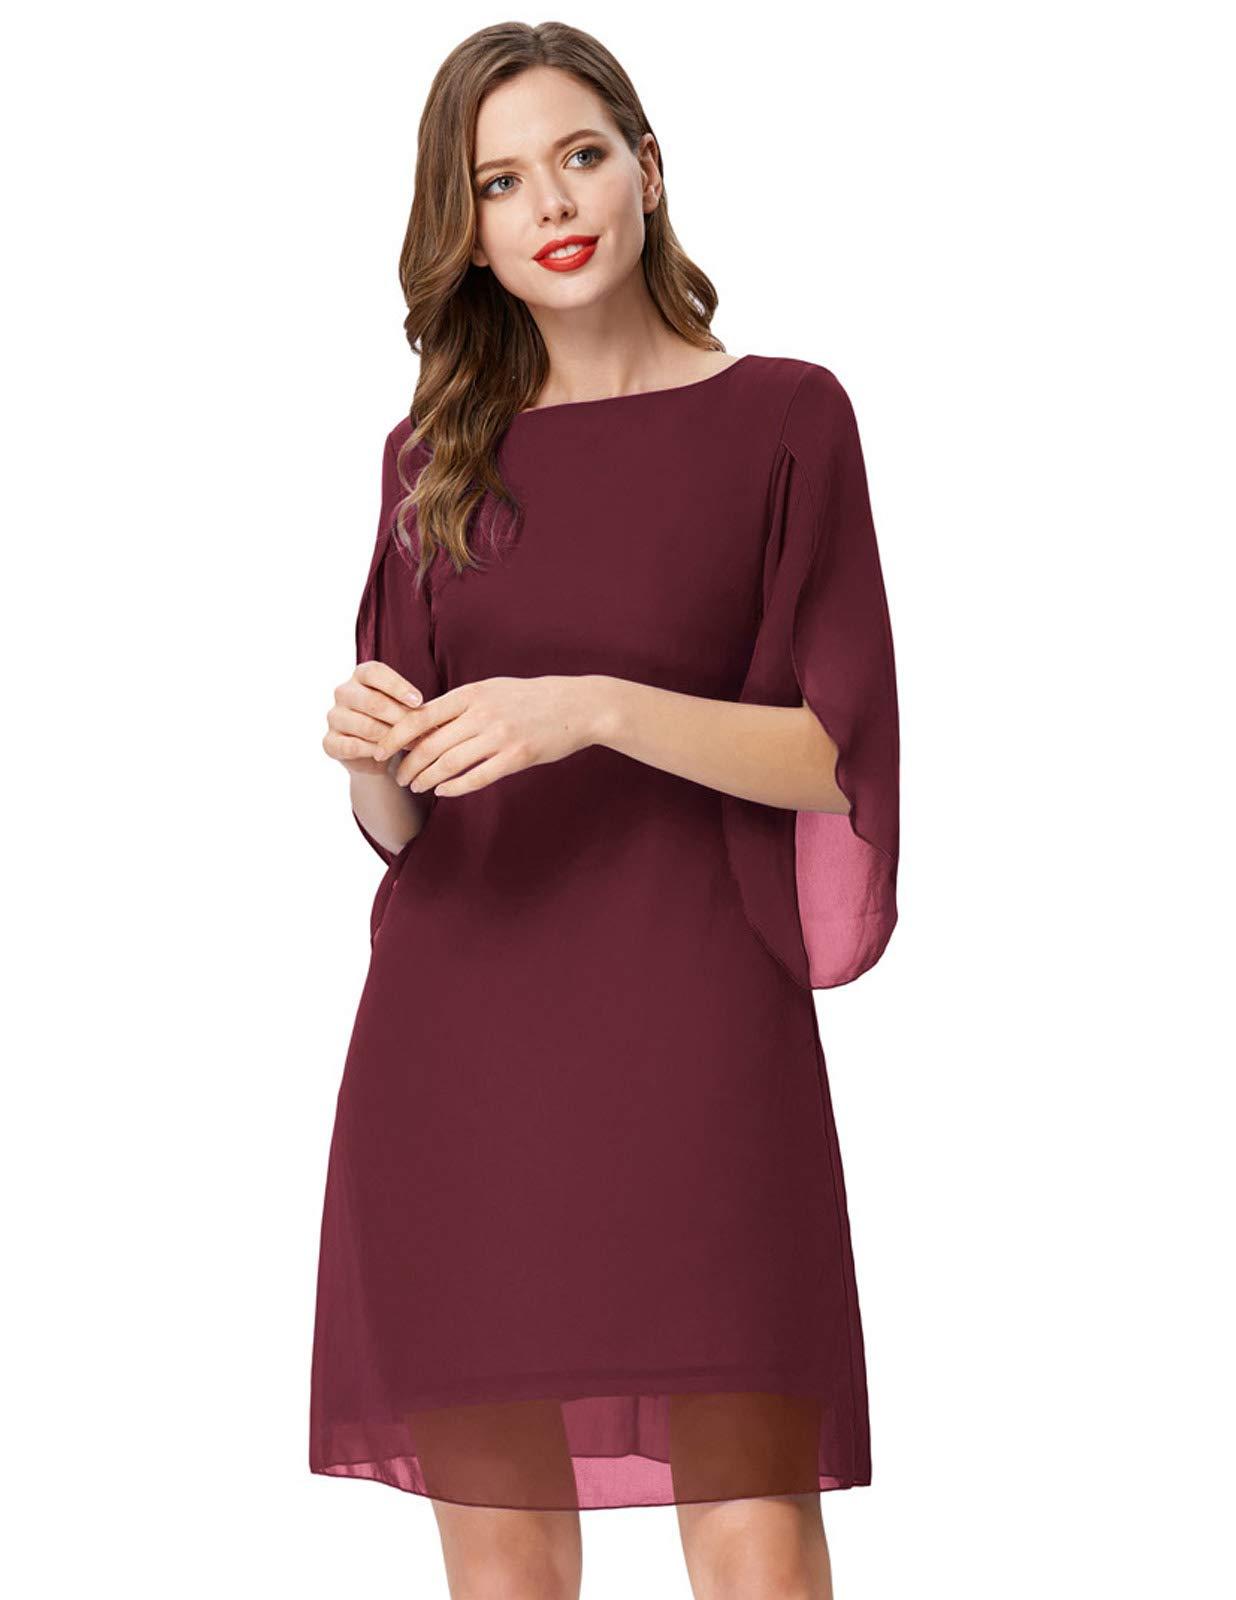 Women Summer Chiffon Dress Split Sleeve Prom Party Midi Dress Plus Size Red  XXL